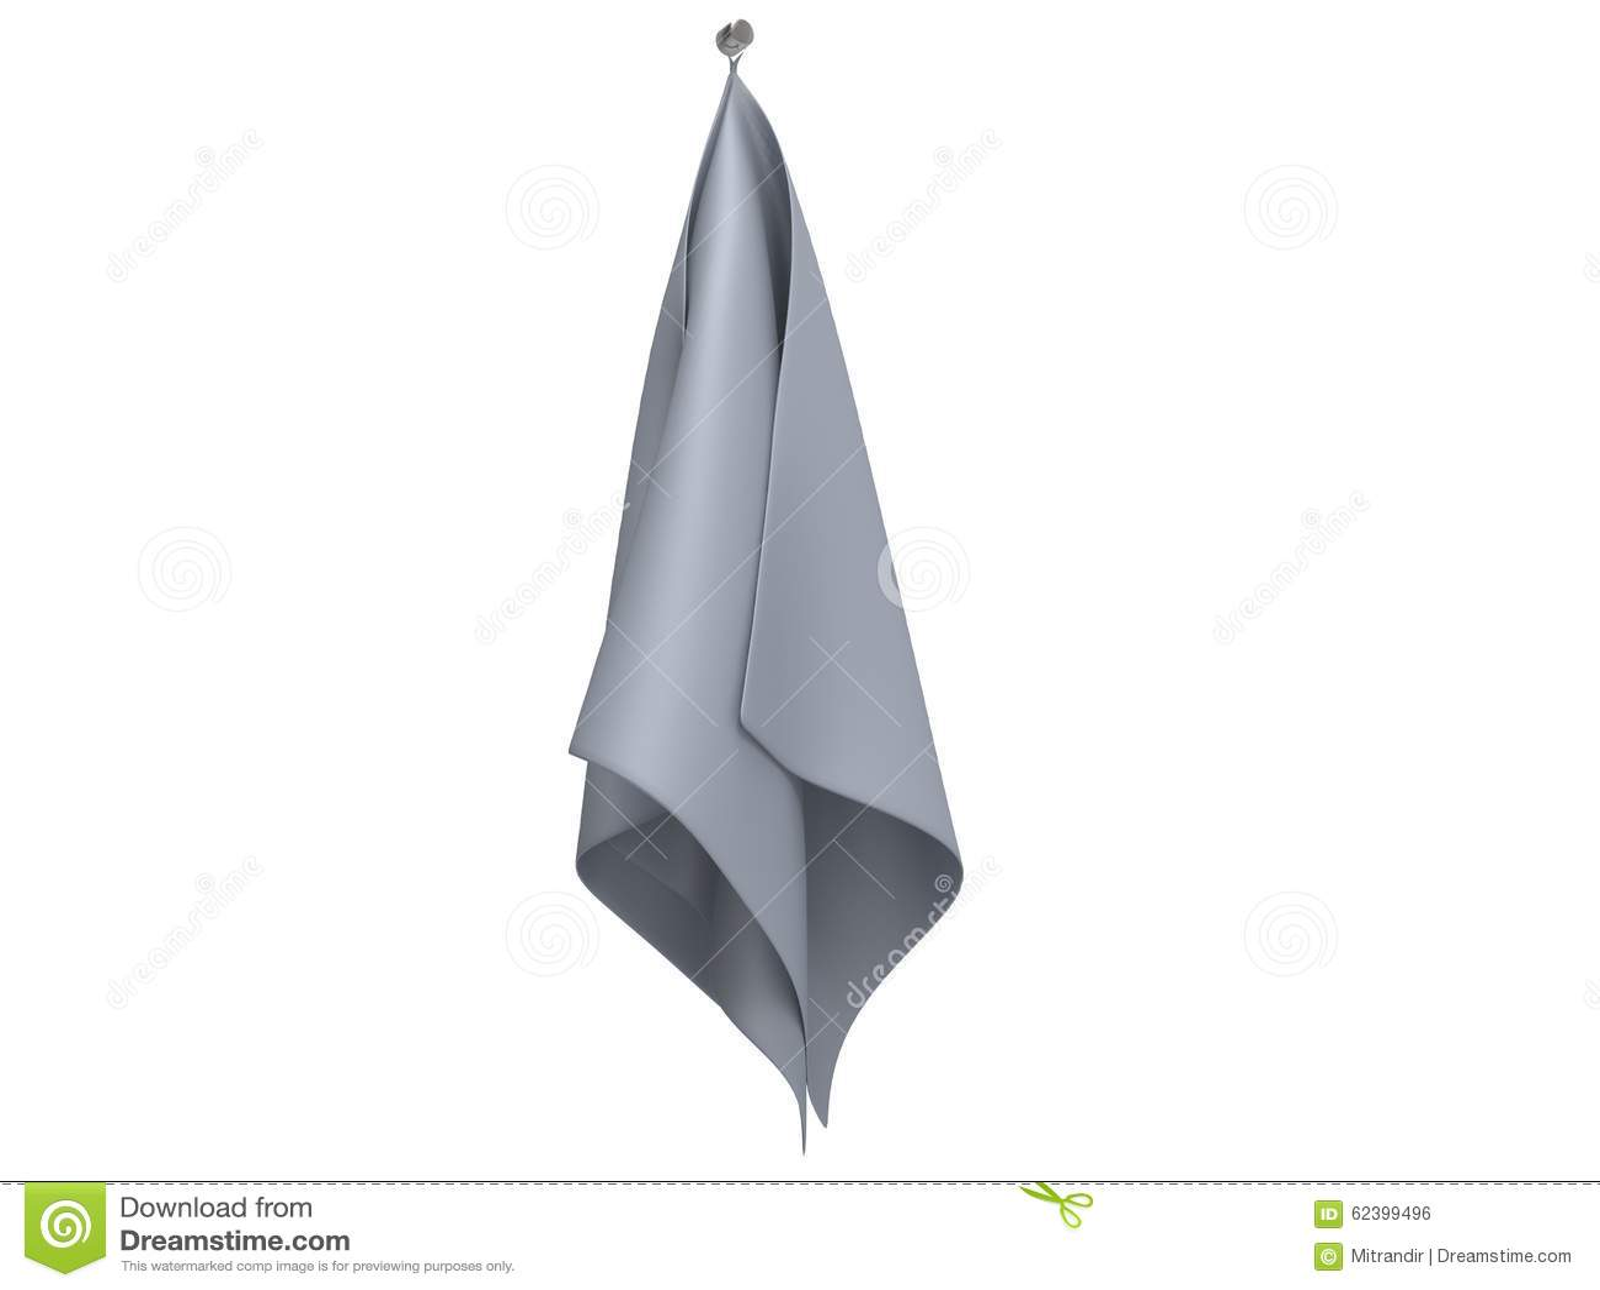 gray kitchen towels can i paint my cabinets 灰色厨房布料库存例证 插画包括有厨房 顶层 餐馆 布料 颜色 检查 在白色背景 隔绝的灰色厨房布料